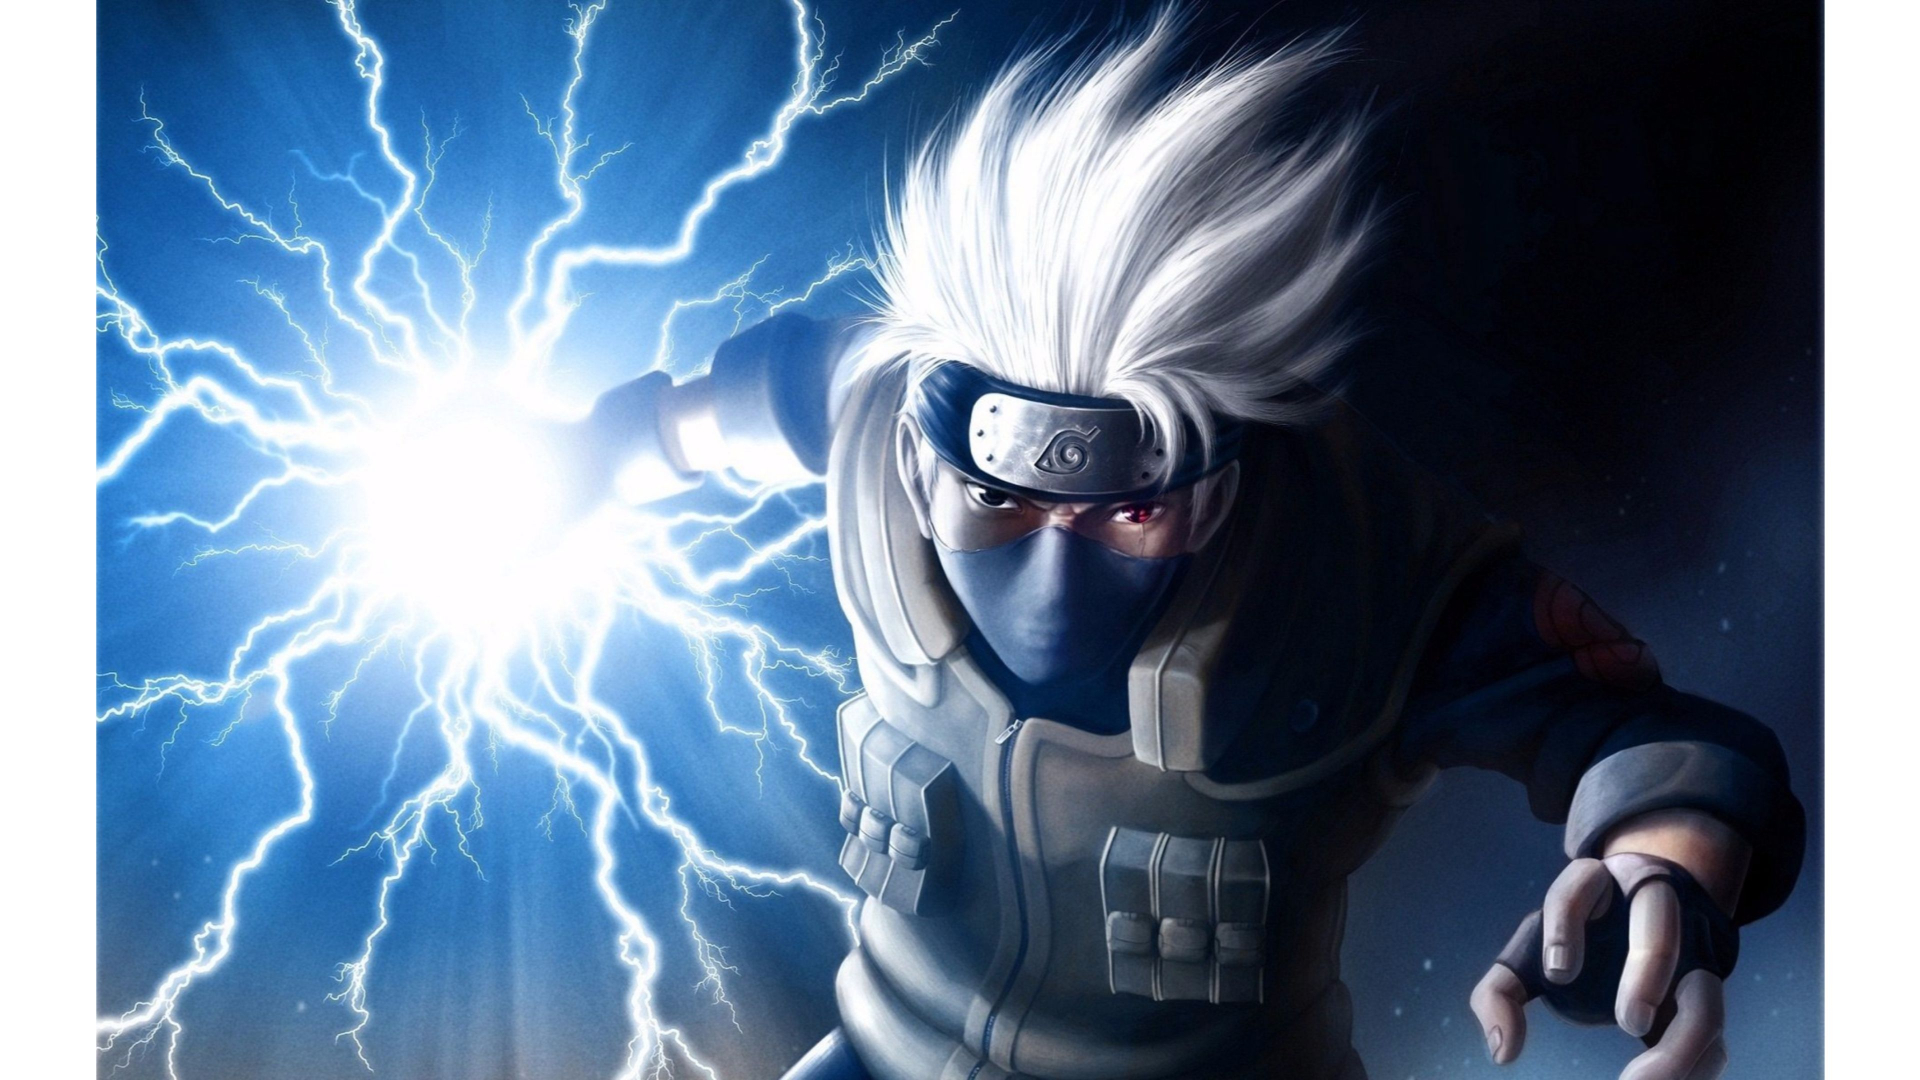 Free download Lightning 2016 4K Anime Wallpaper 4K ...